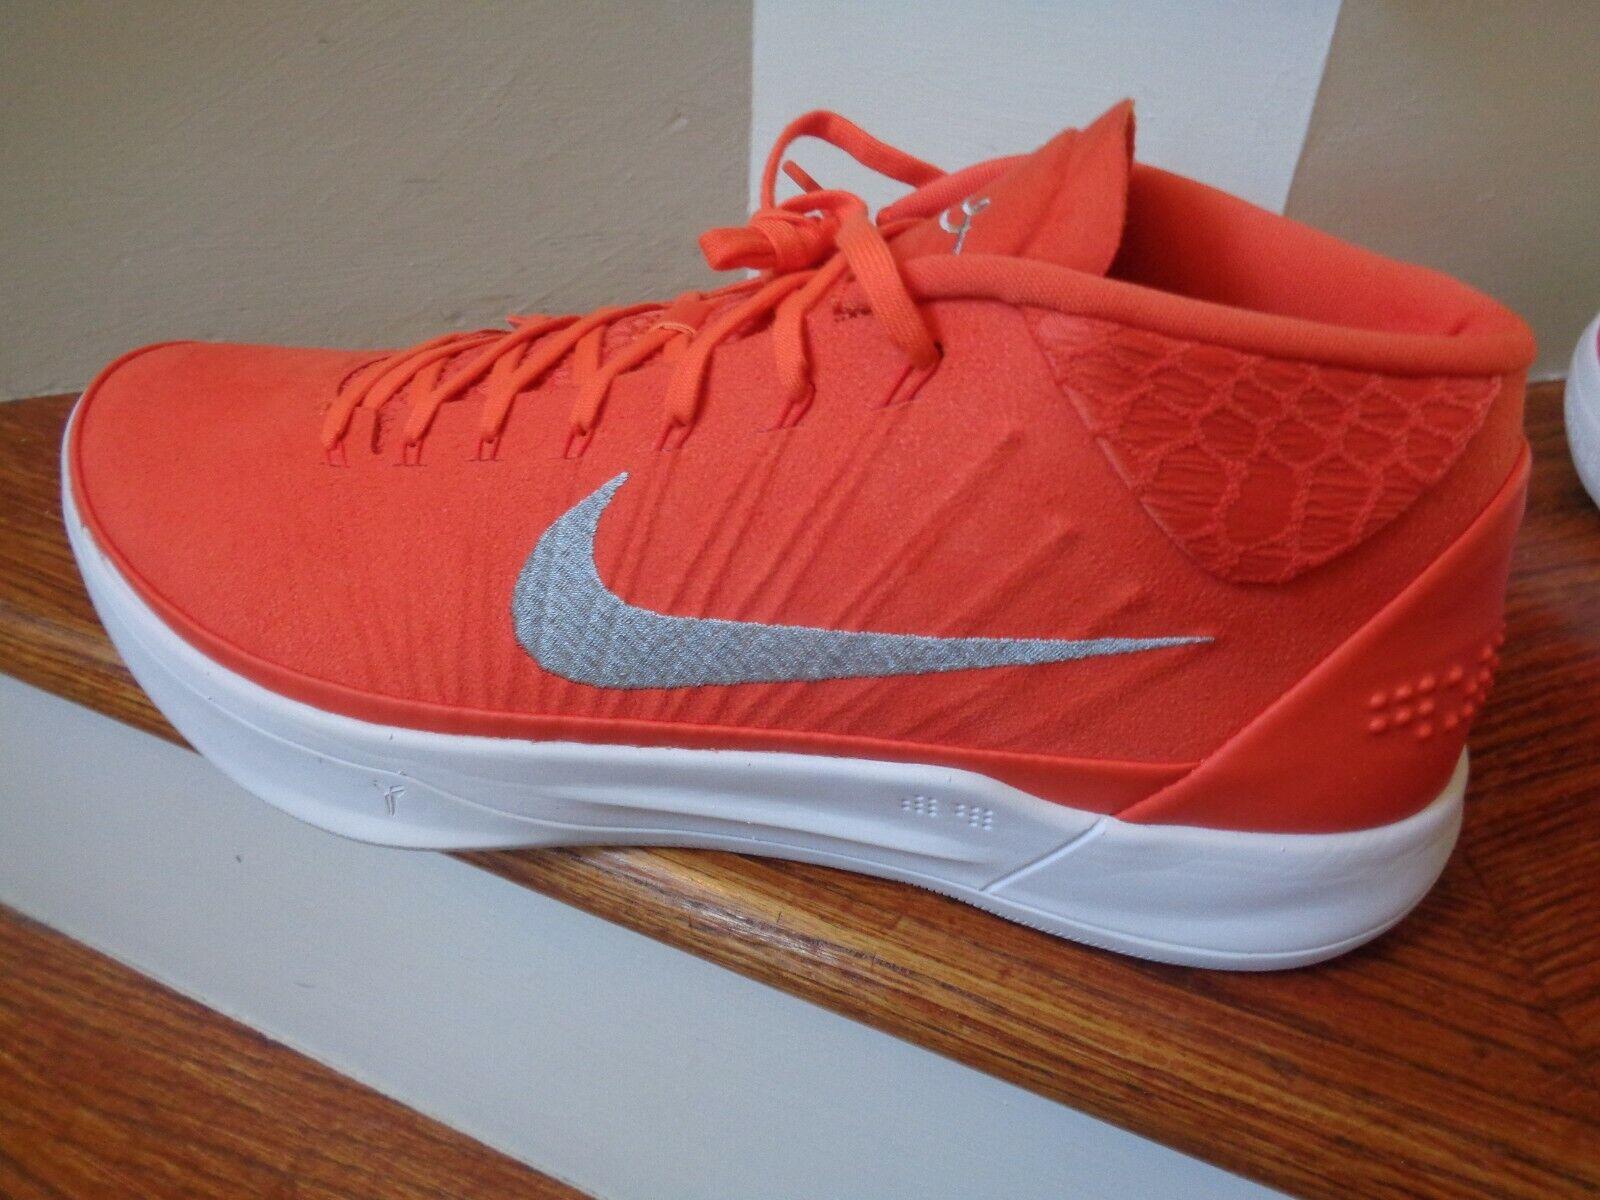 Nike Kobe AD TB Promo Men's Basketball shoes, 942521 801 Size 13 NEW